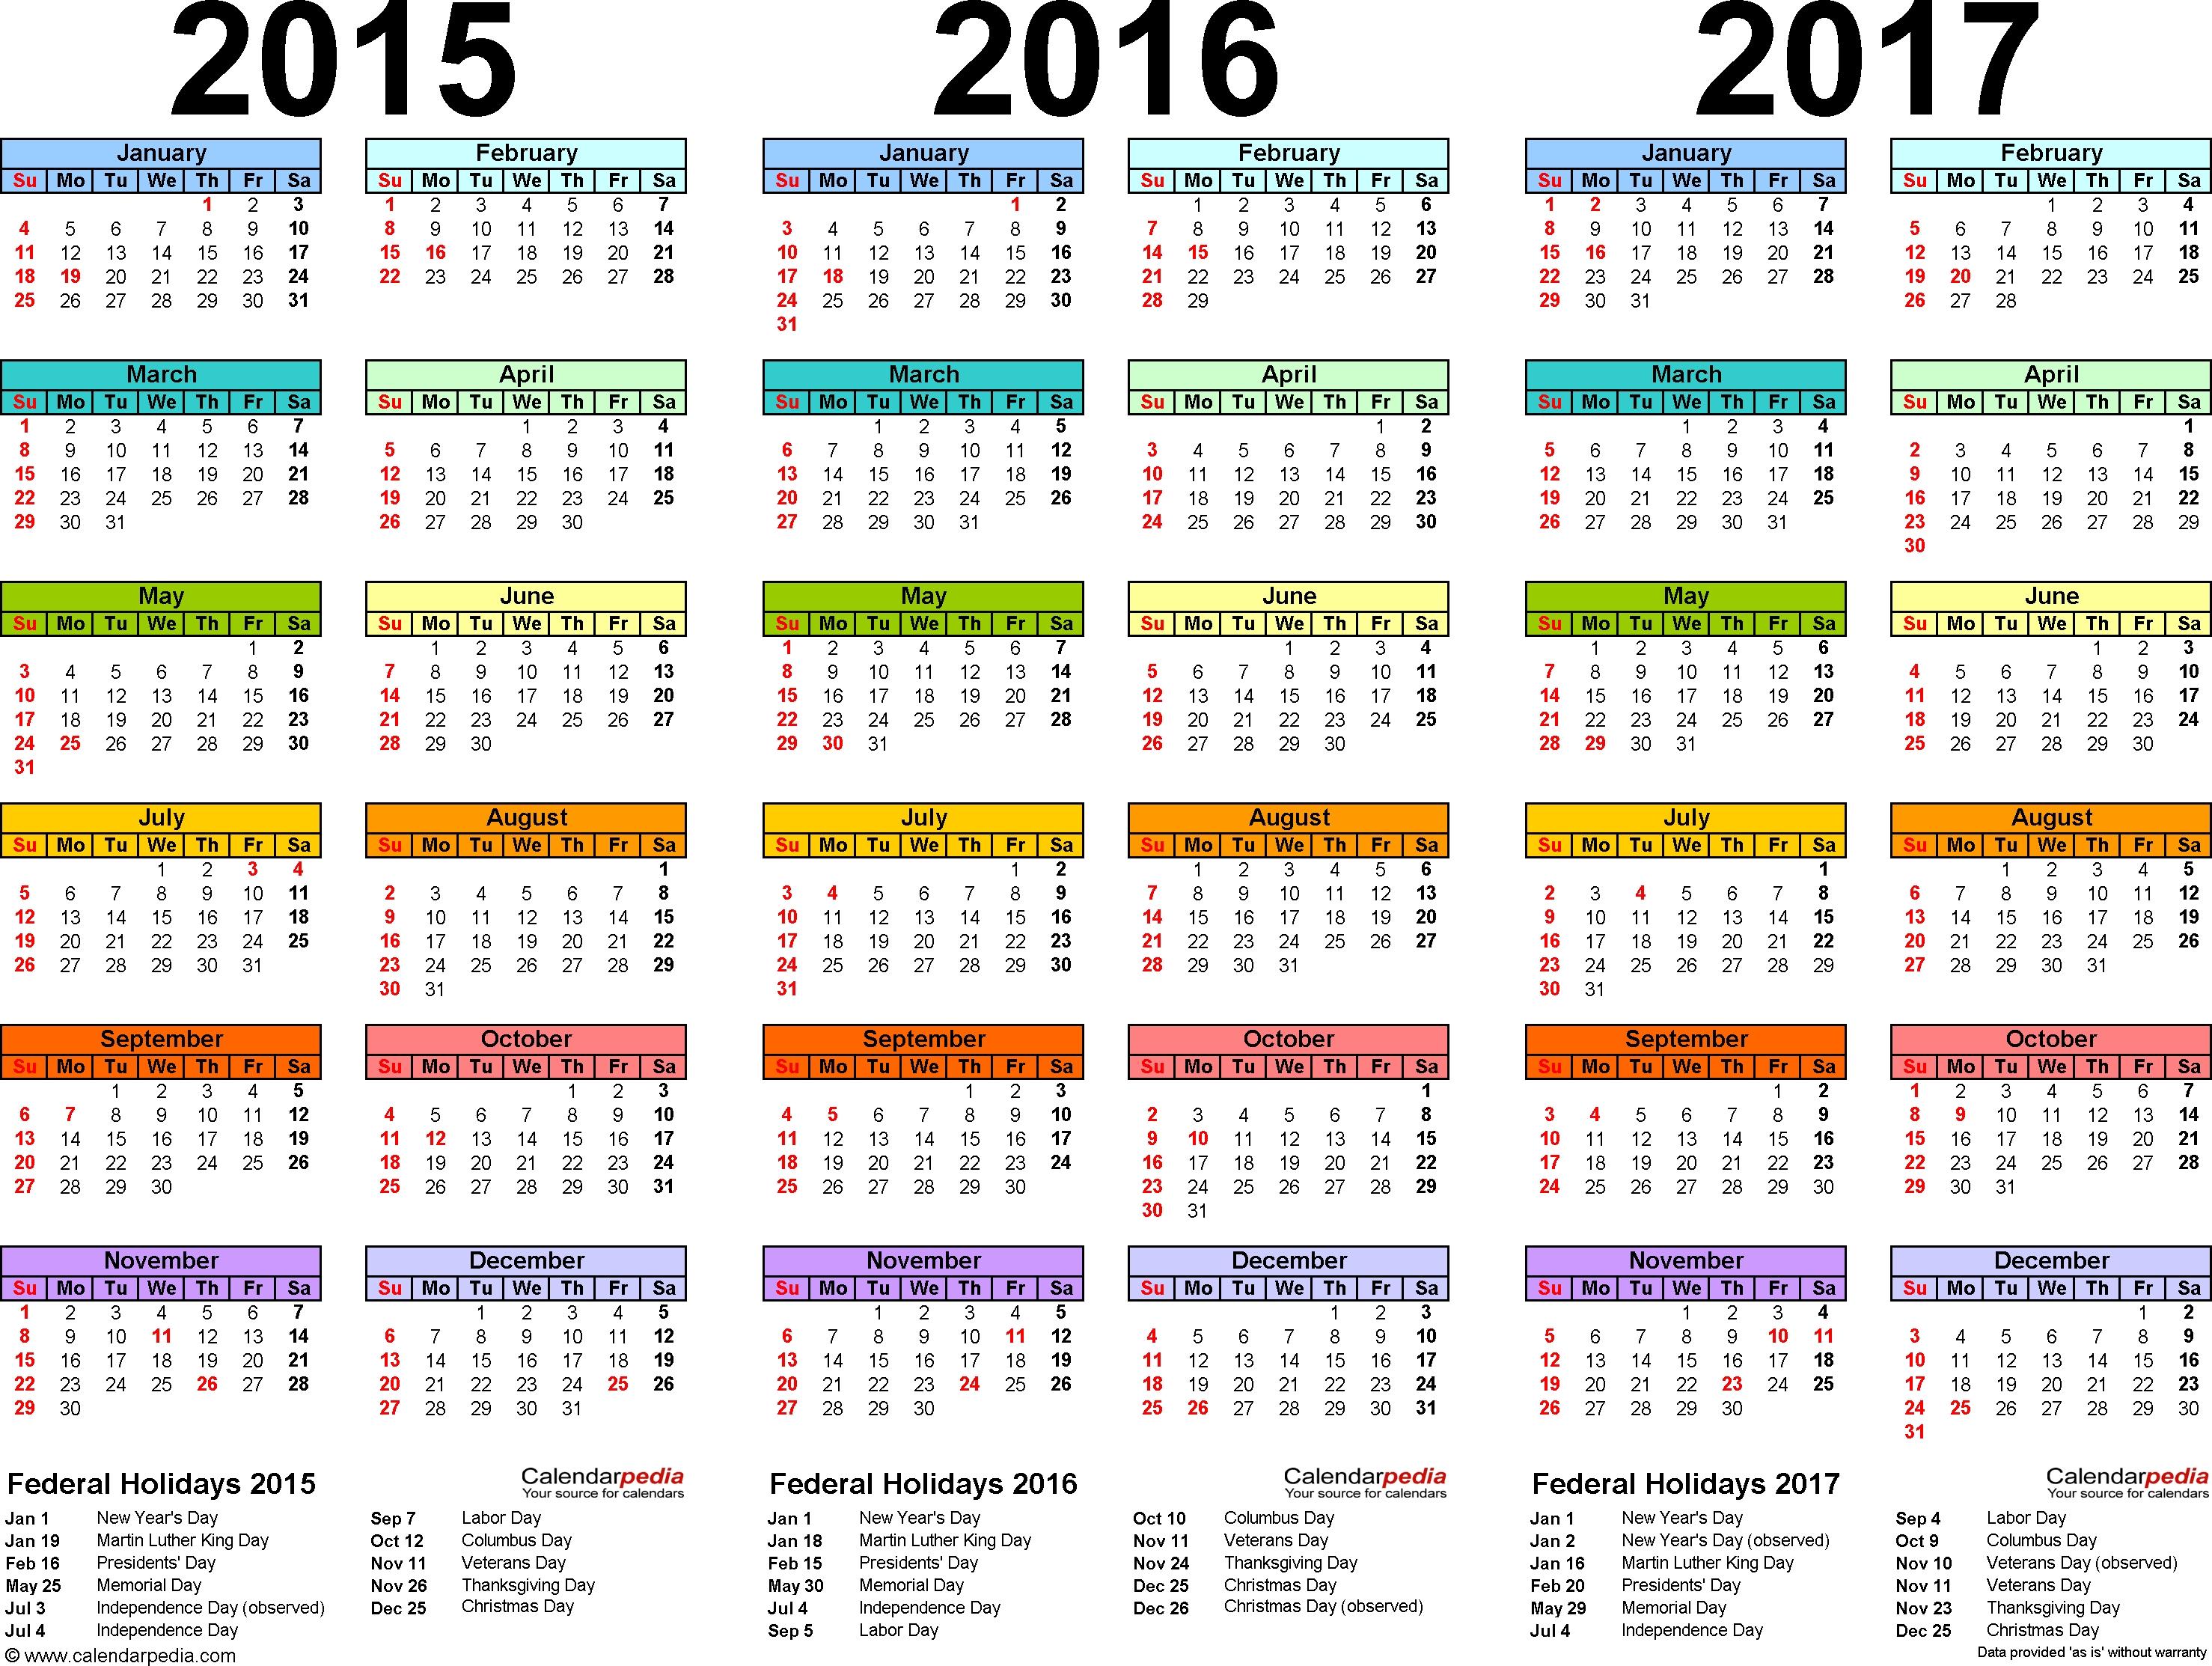 2015 Calendars | Template 1: Pdf Template For Three Year Calendar throughout Islamic Calendar 2015 Pdf Free Download